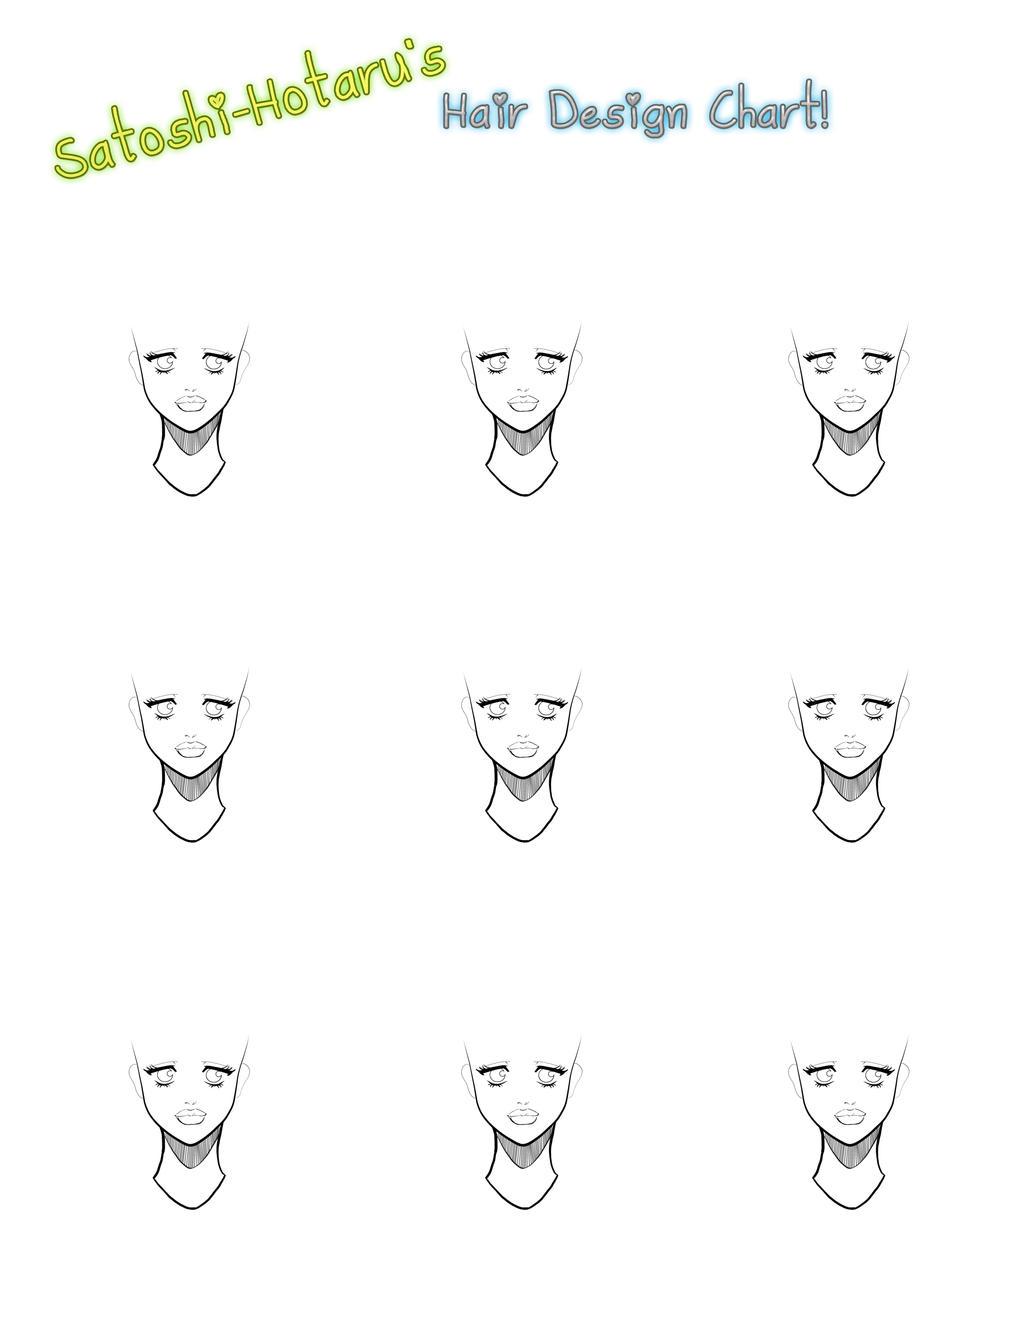 Anime Character Design Template : Blank hair design sheet by satoshi hotaru on deviantart